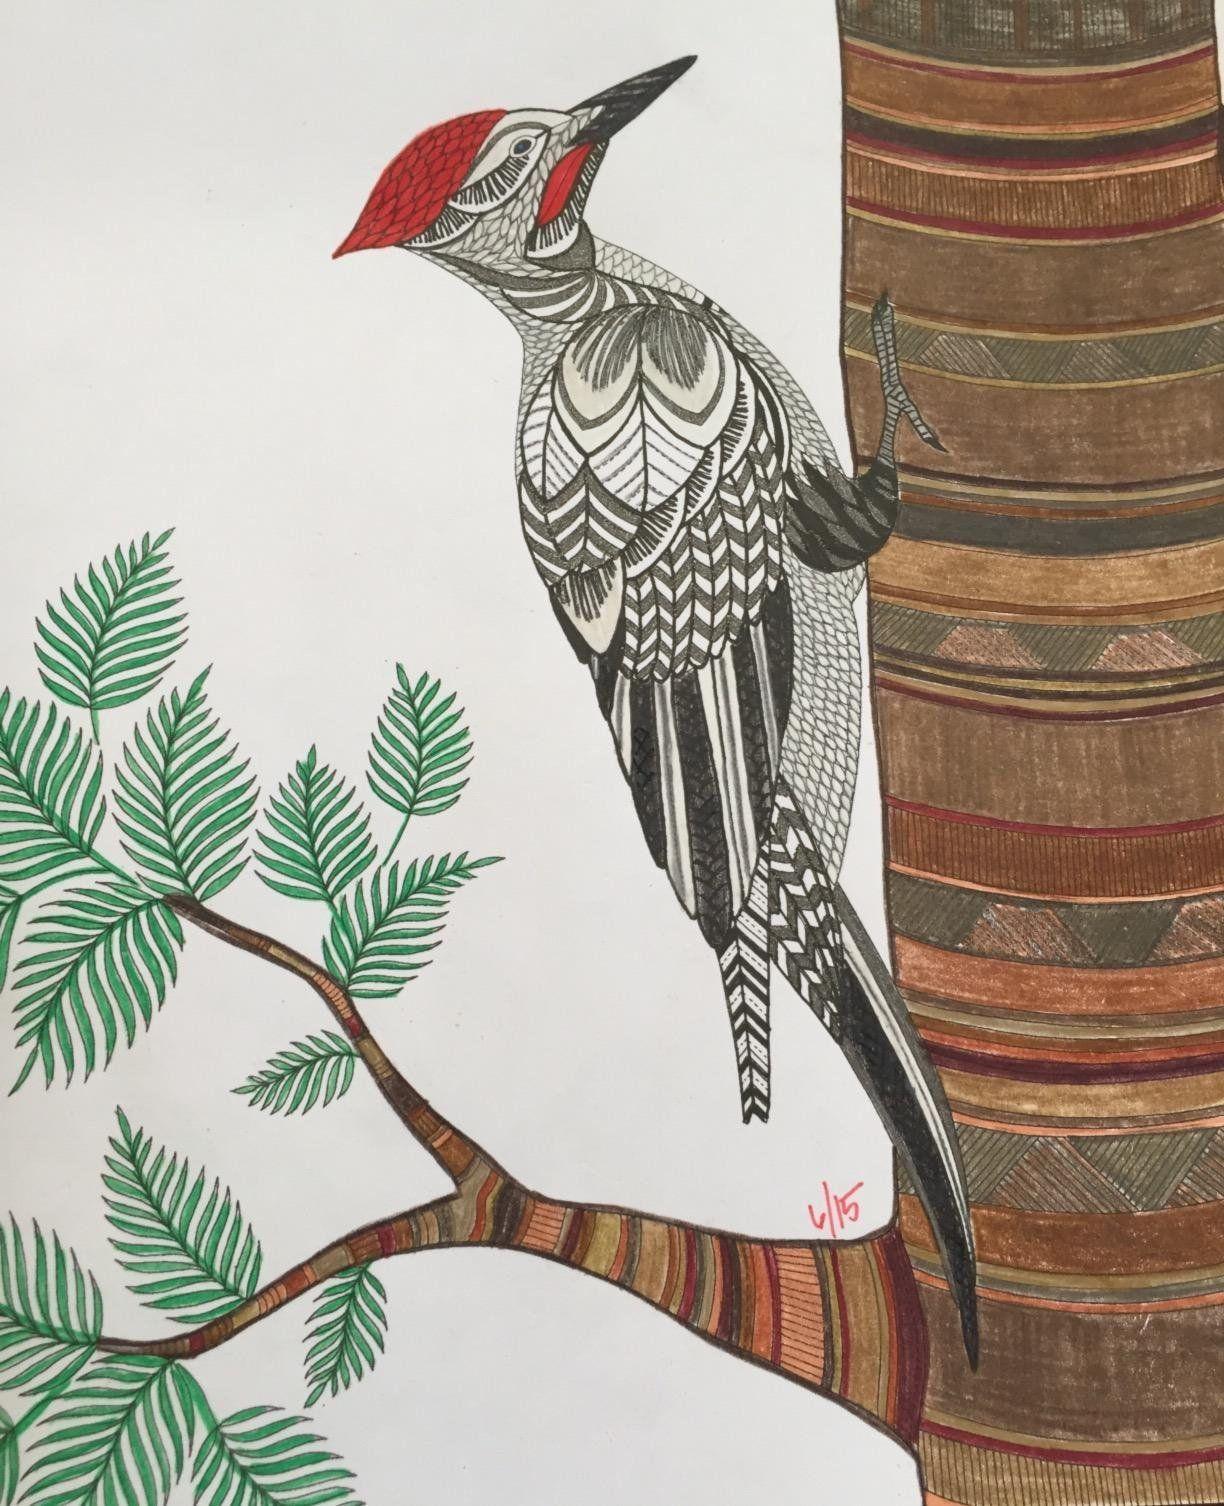 Animal Kingdom Color Me Draw Millie Marotta 9781454709107 Amazon